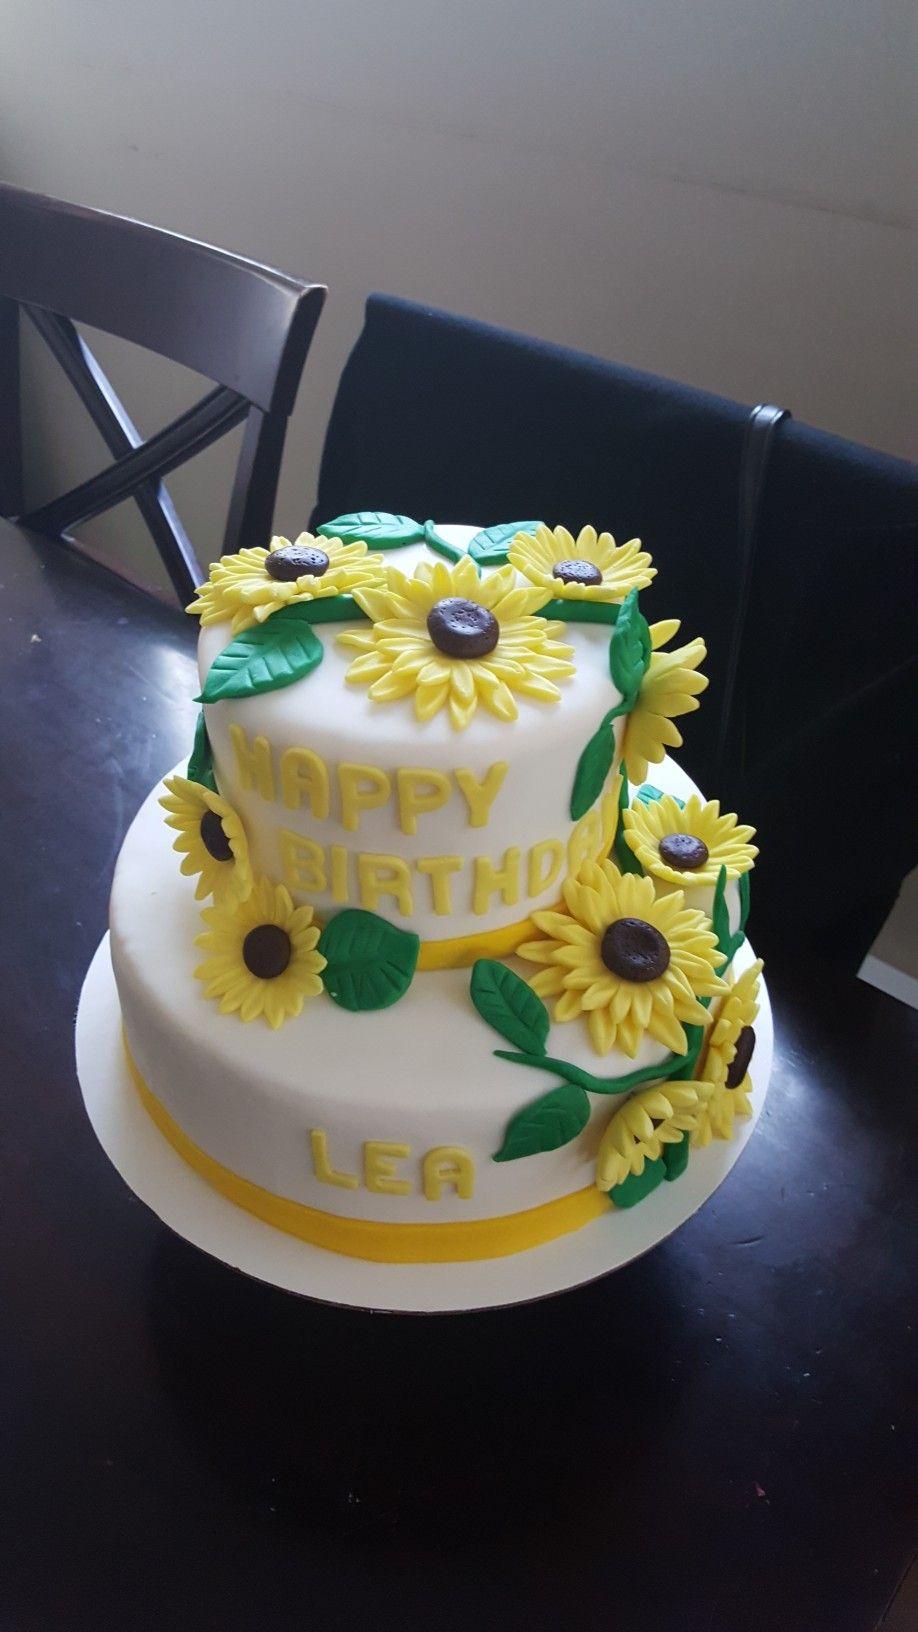 Pleasing Sunflower 2 Tier Cake With Images Sunflower Birthday Cakes Funny Birthday Cards Online Necthendildamsfinfo